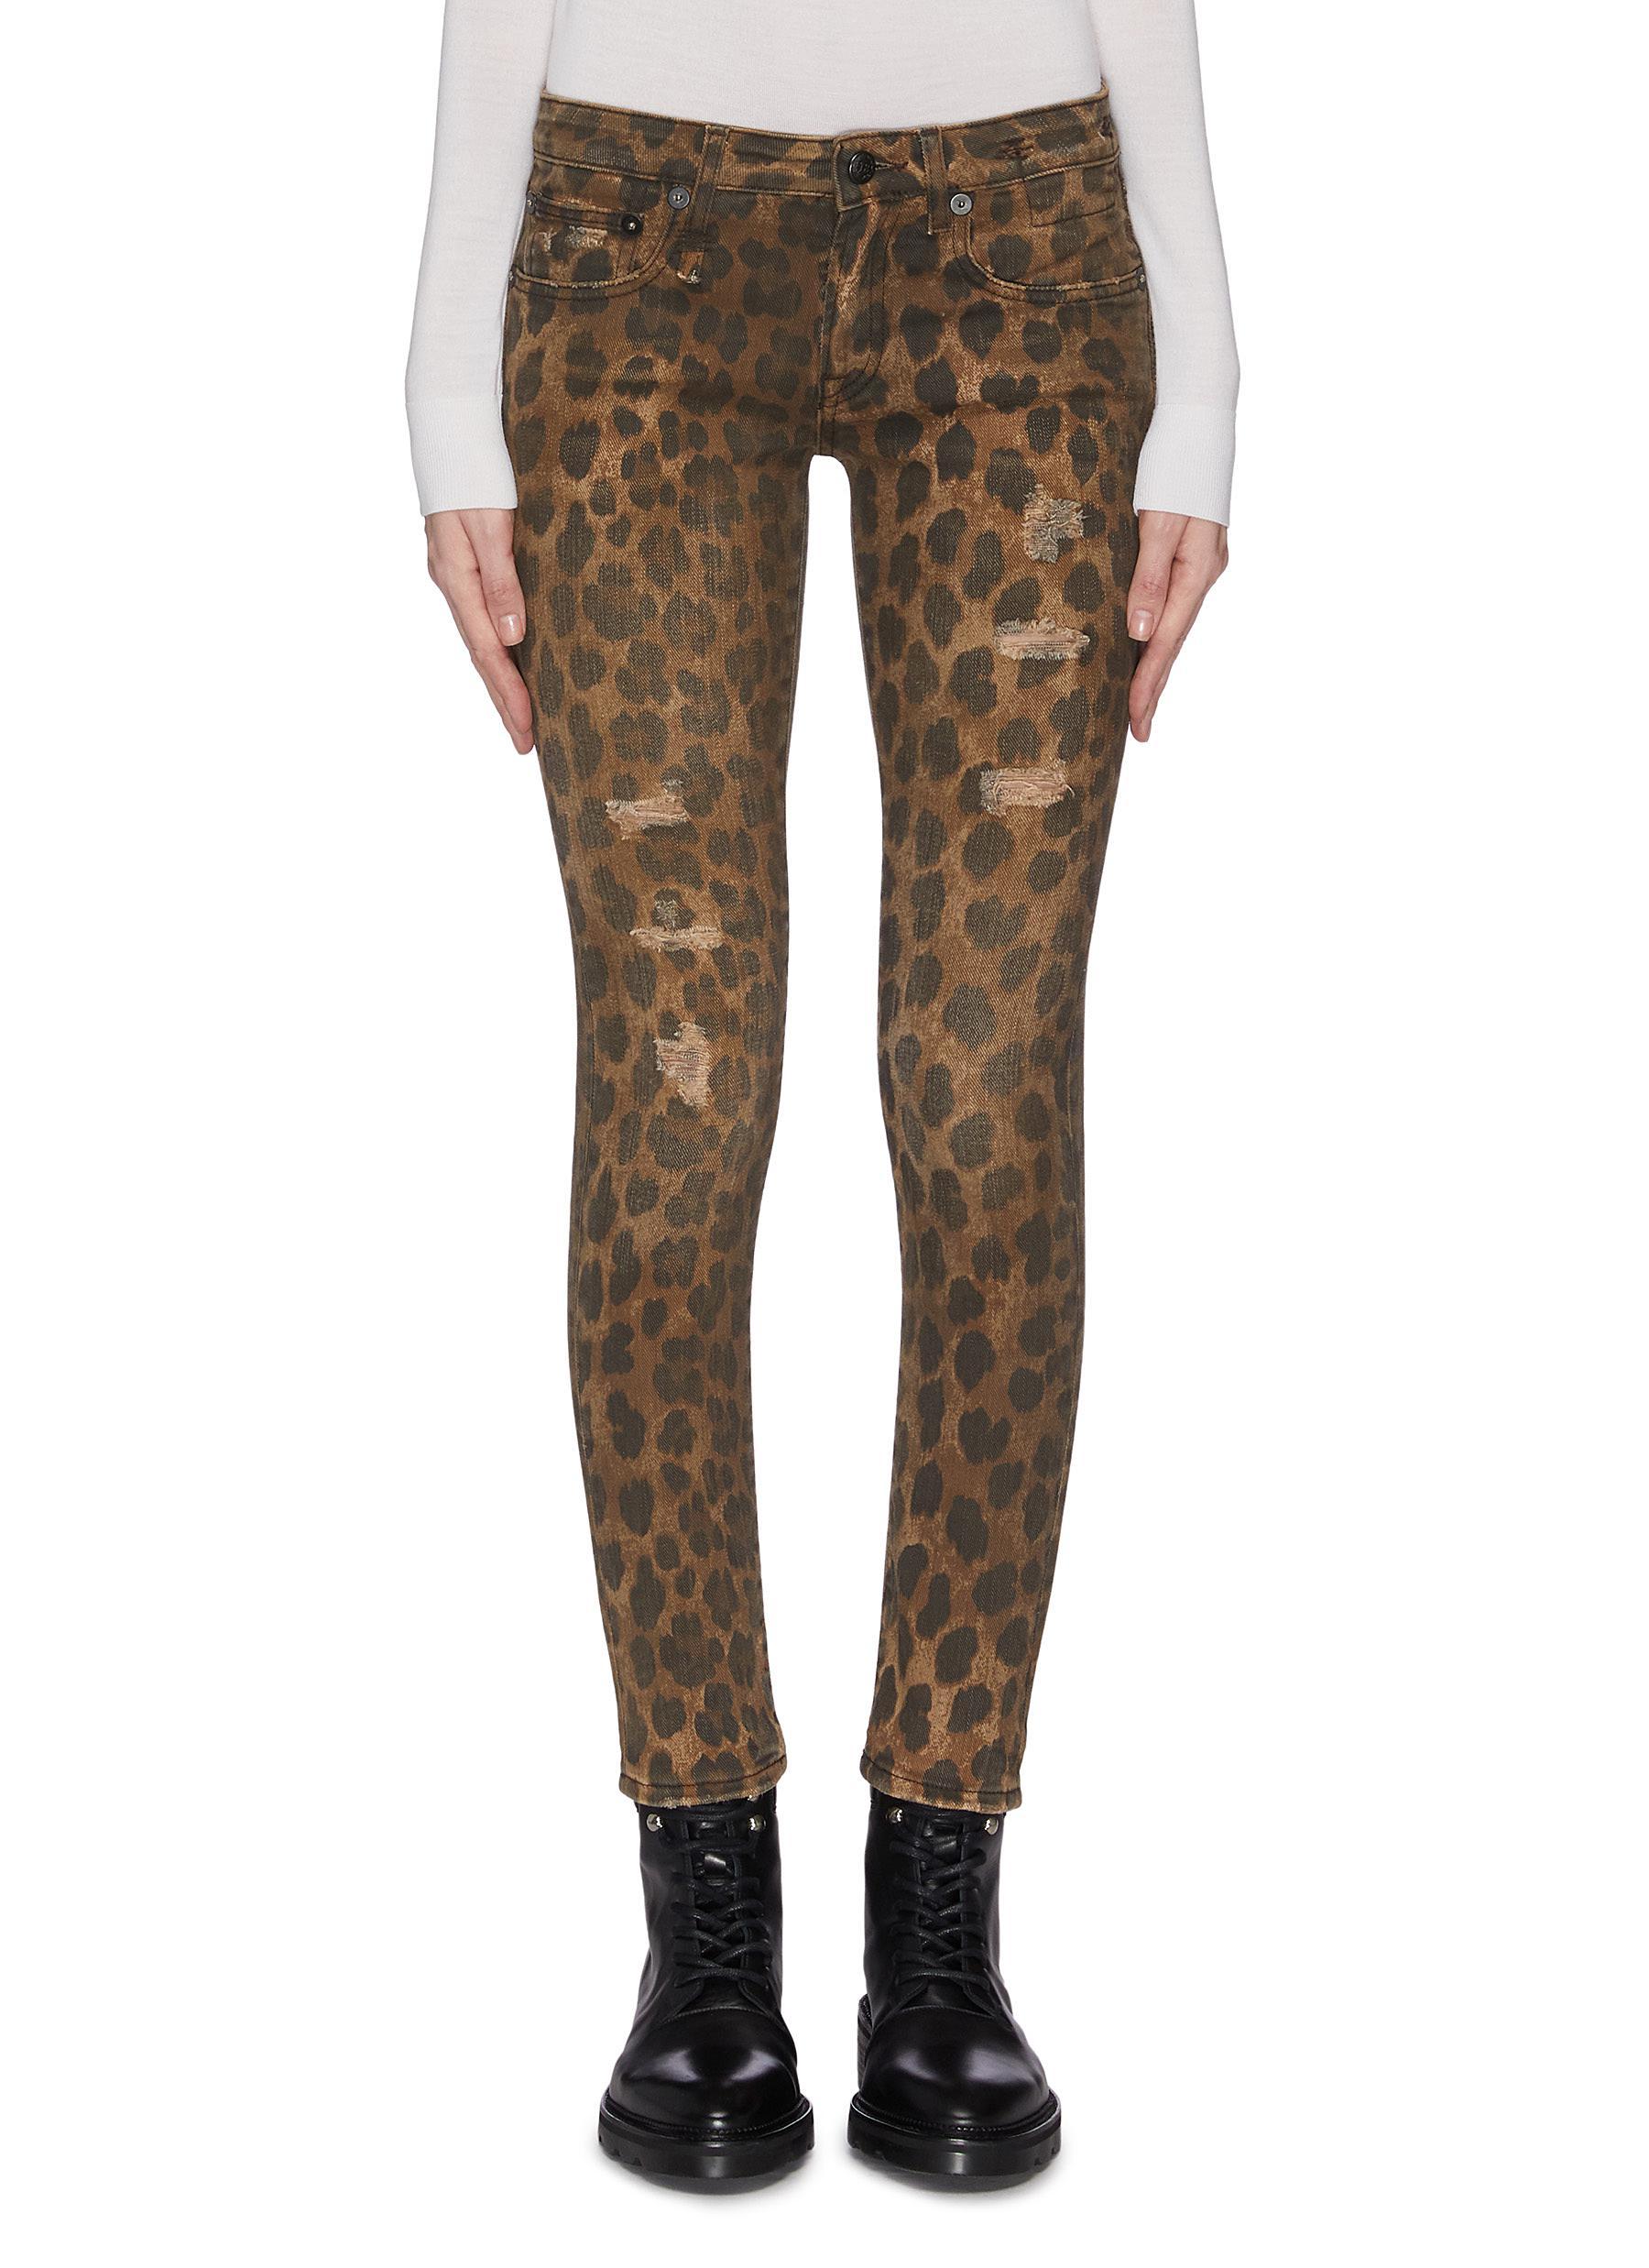 Buy R13 Jeans 'Kate' leopard print skinny jeans